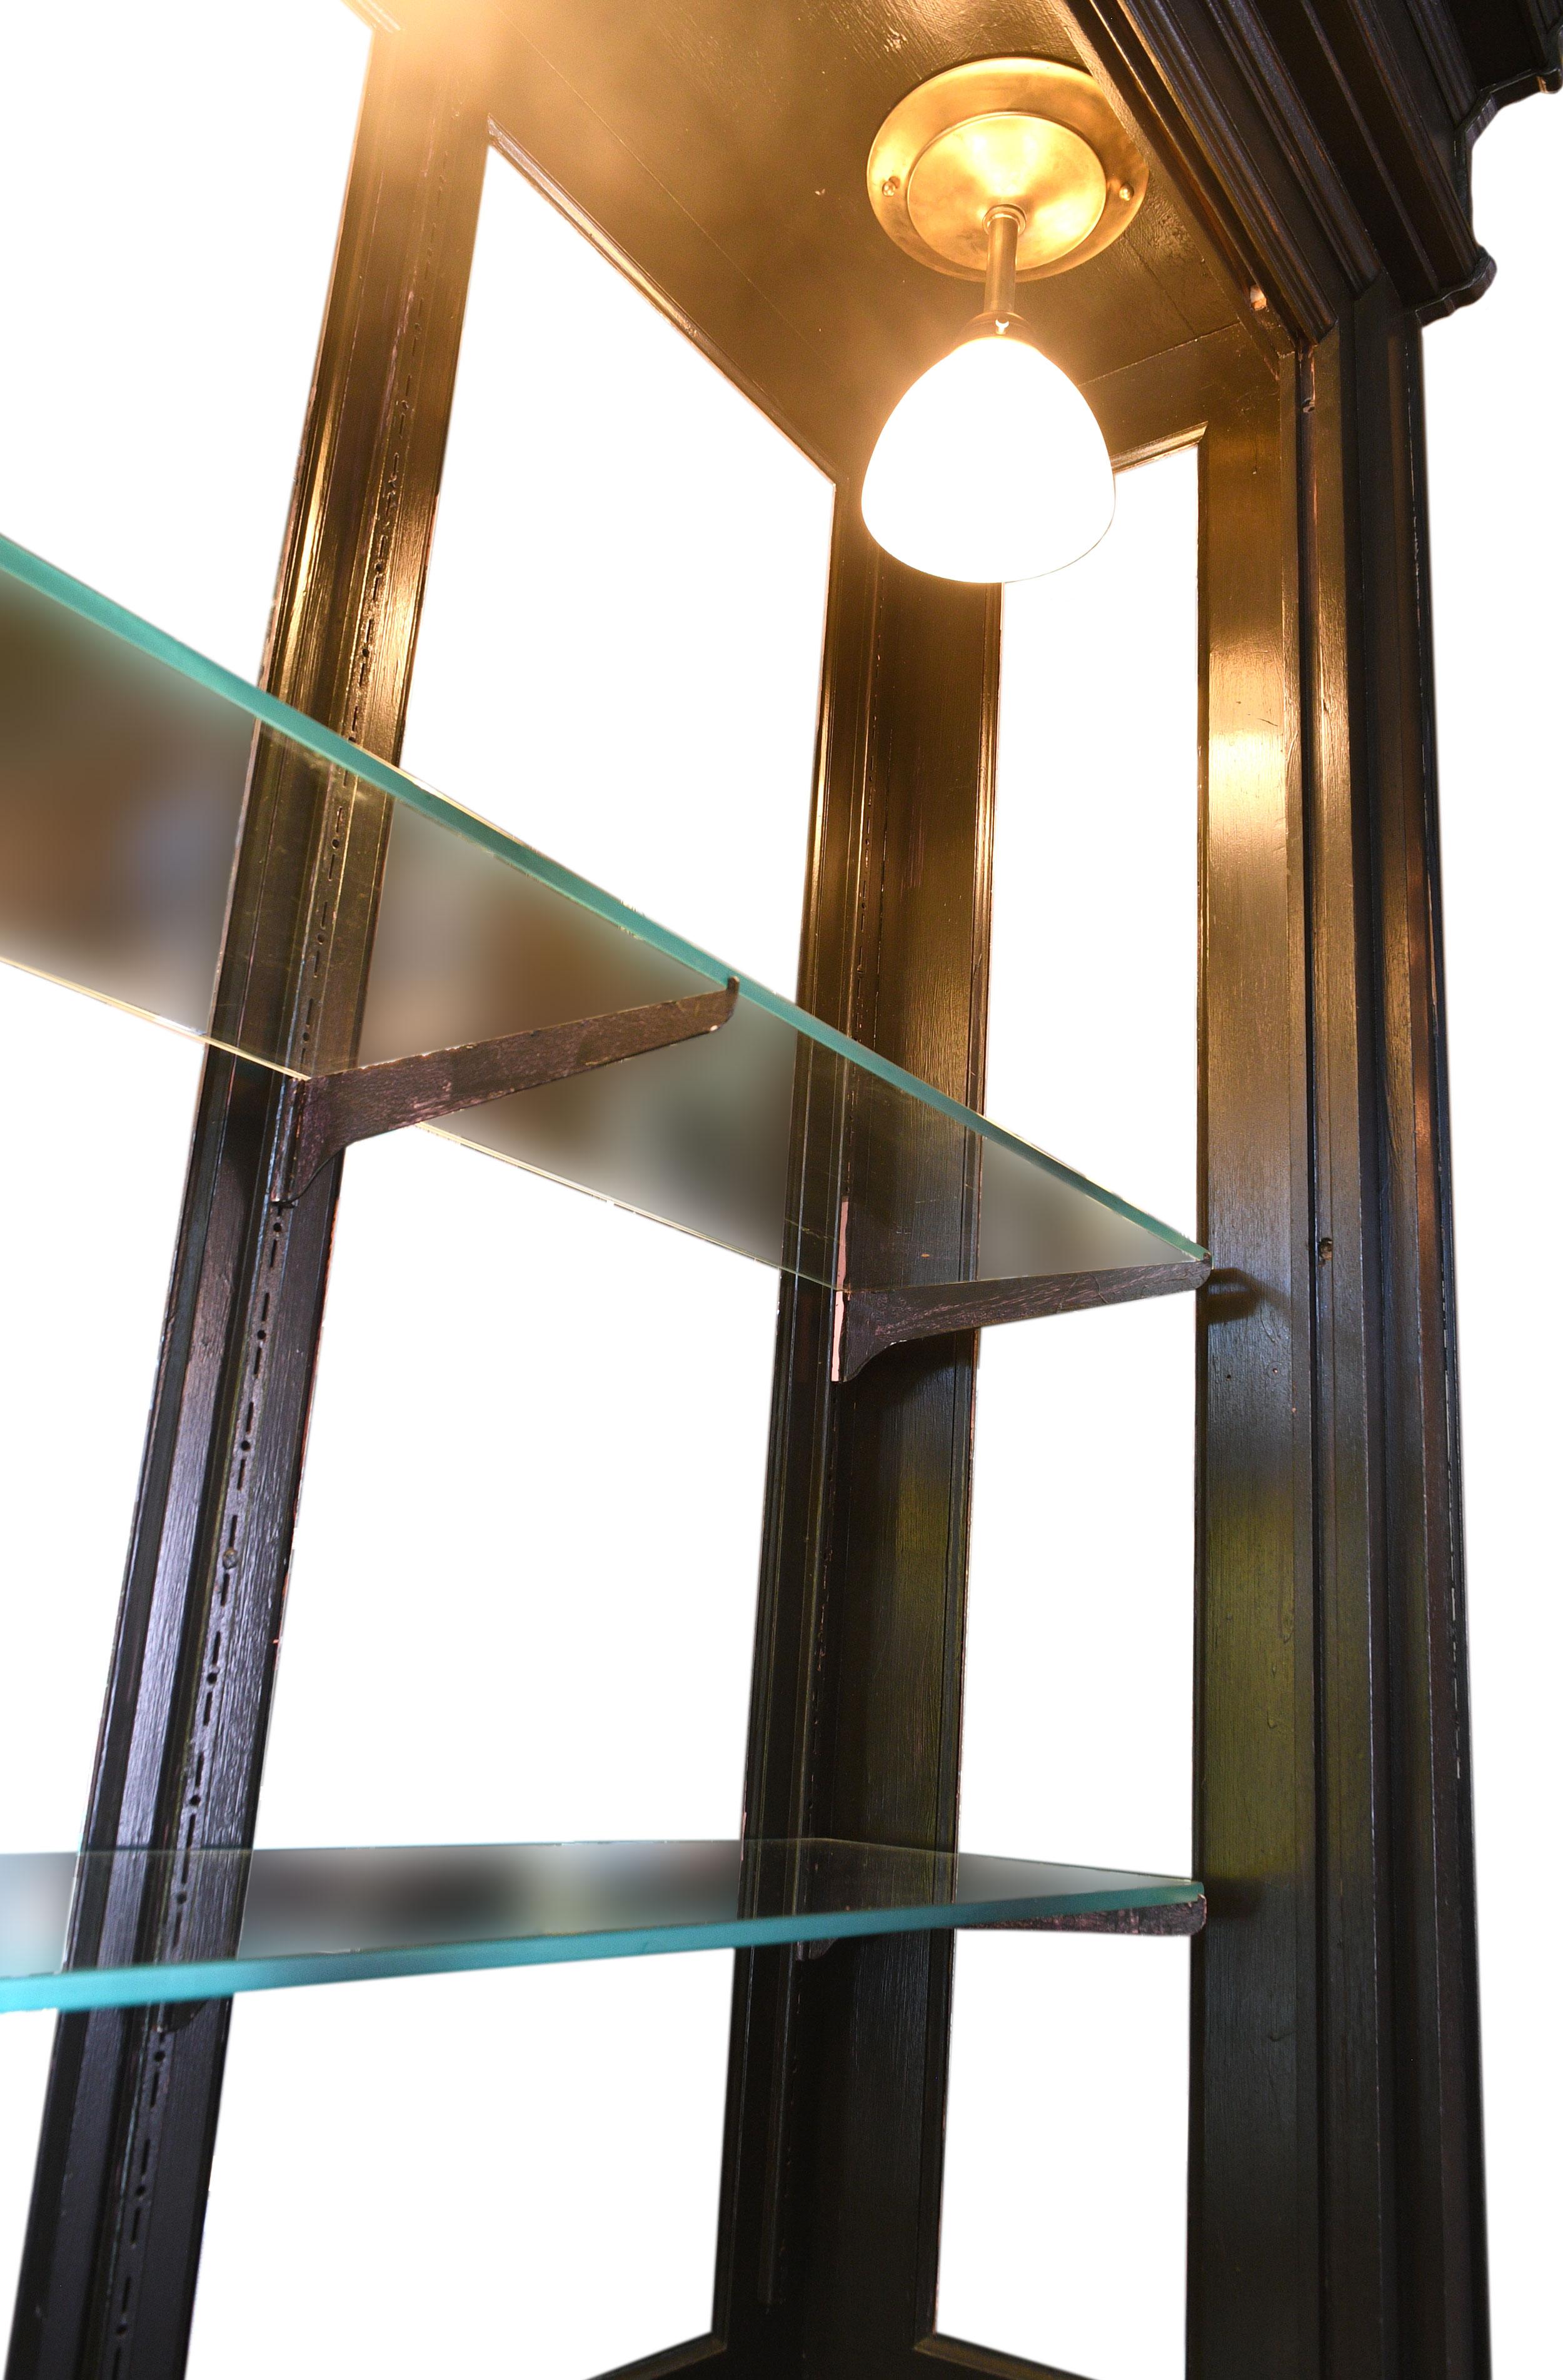 48317-mirrored-cabinet-1.jpg